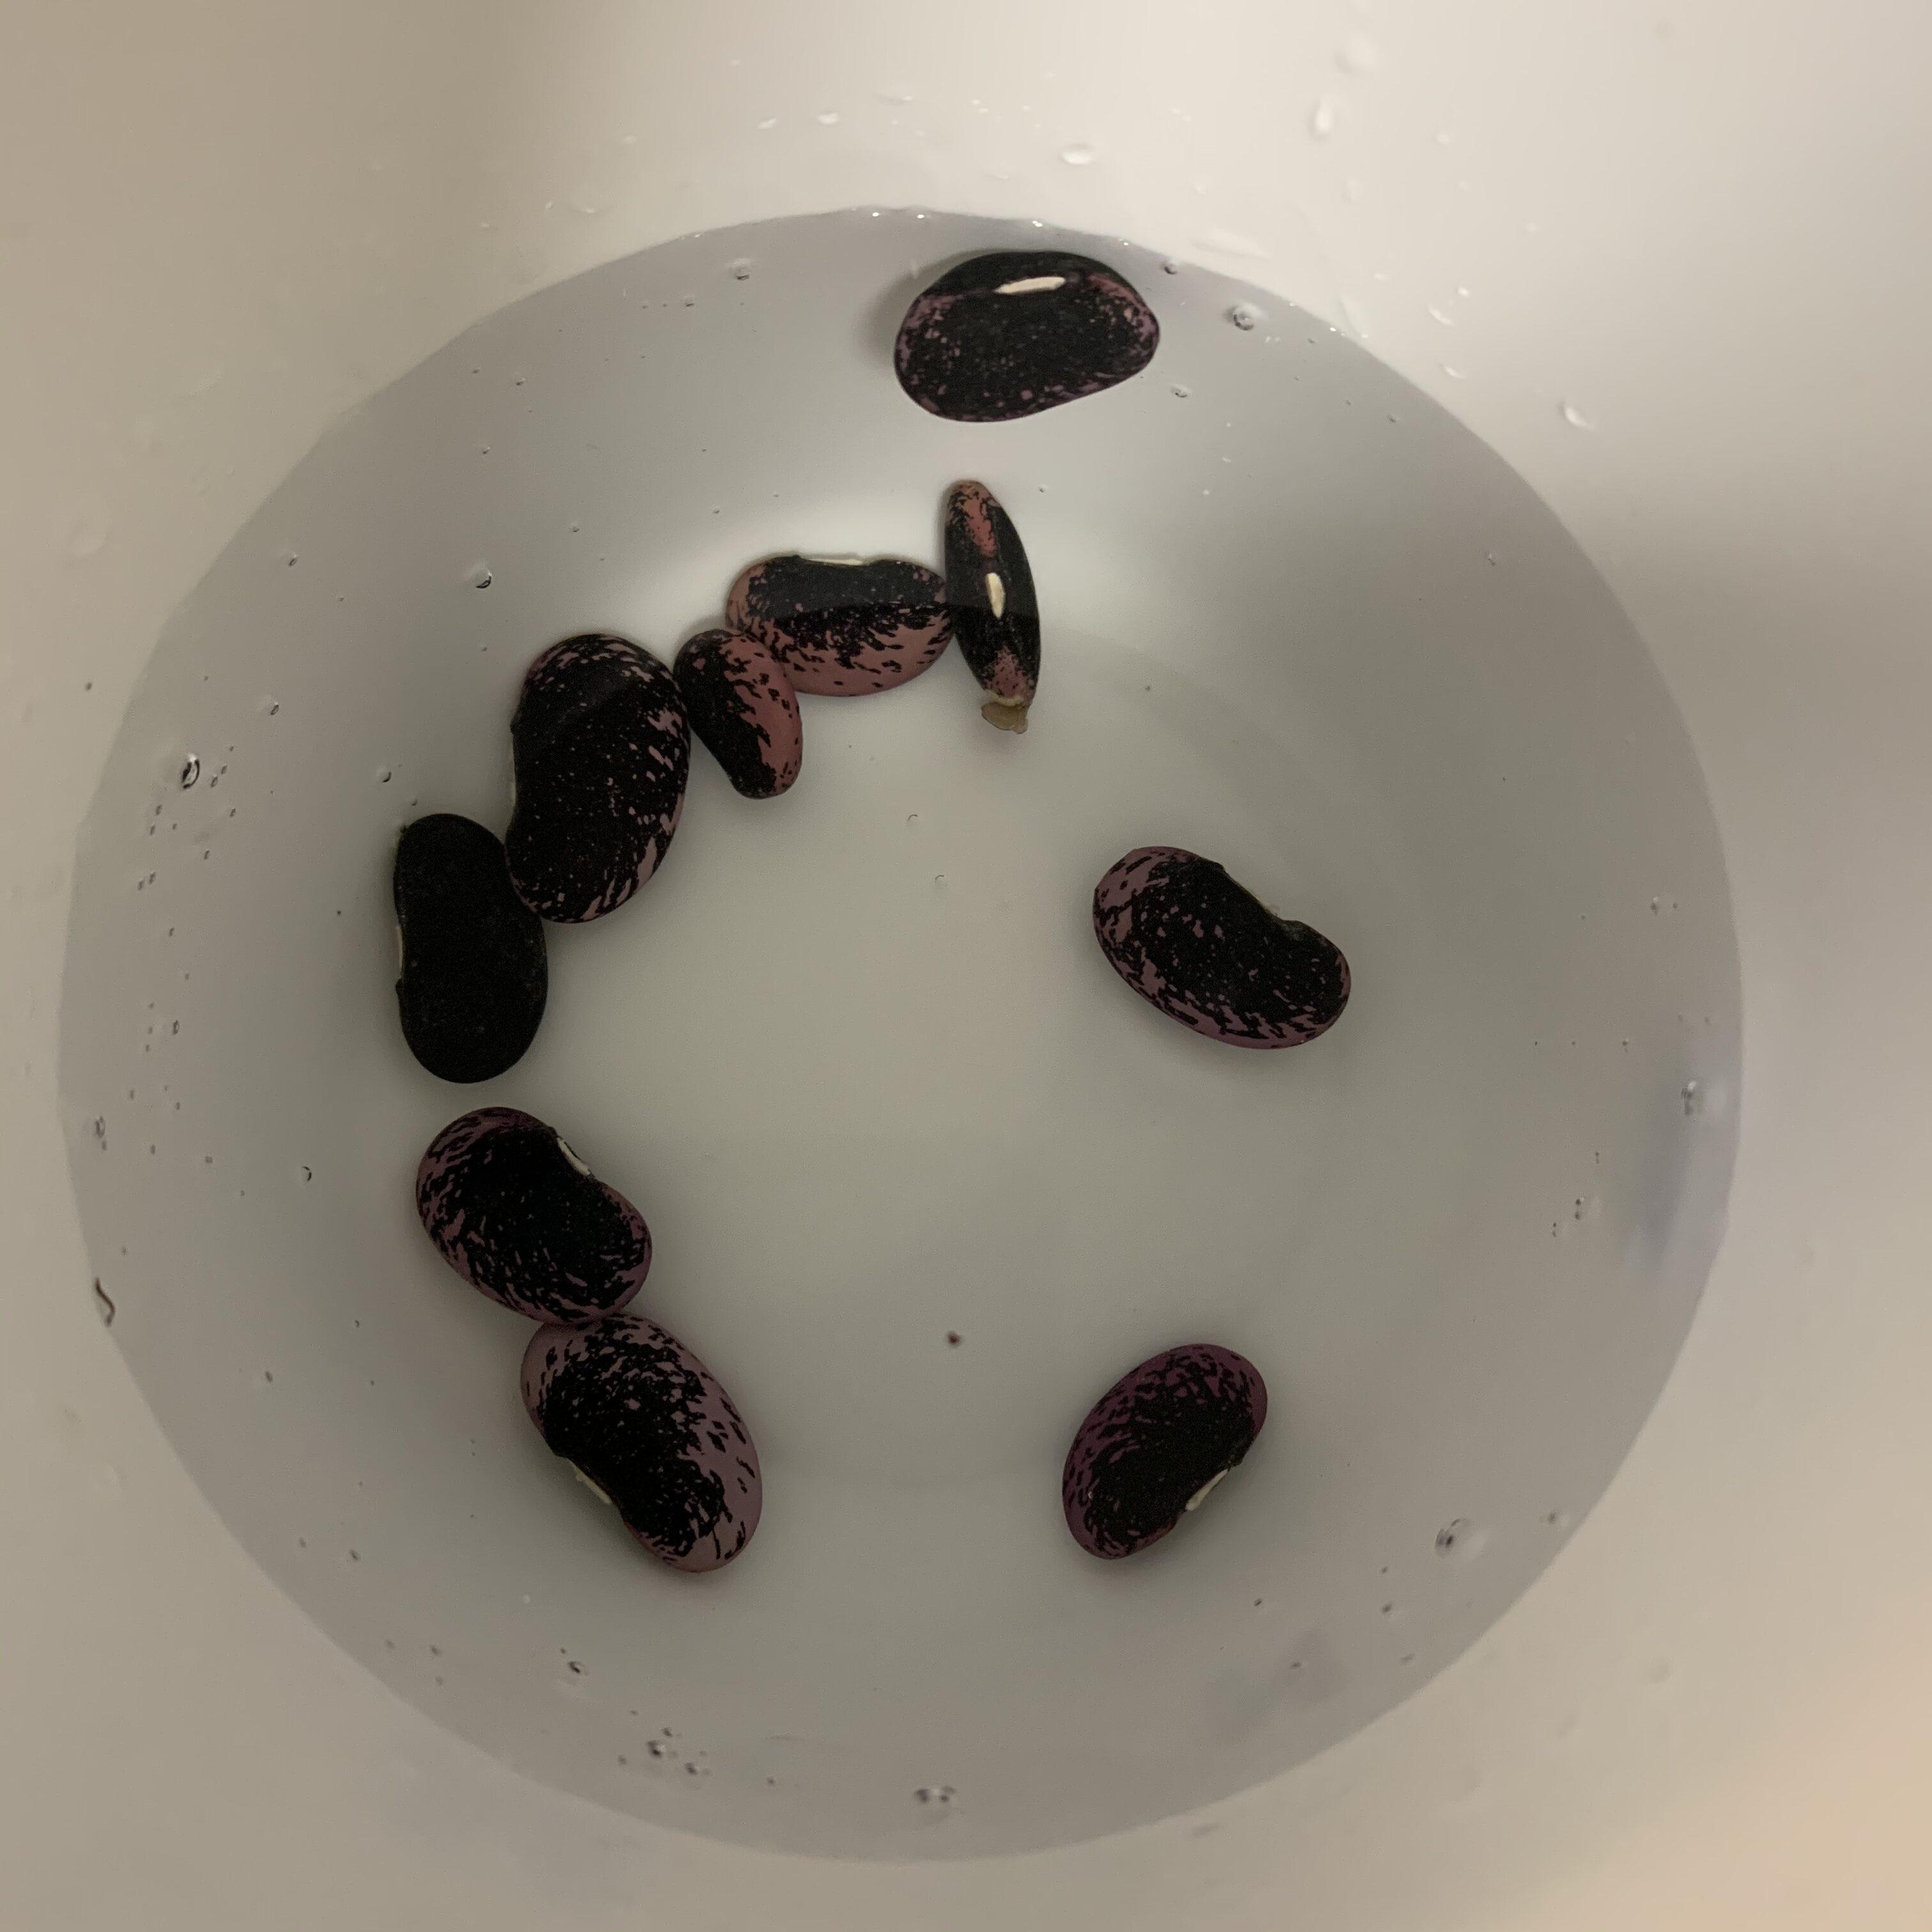 09D429DA 333D 40E4 88CA FD3119331394 Sprouting Scarlet Runner Beans in a plastic bag